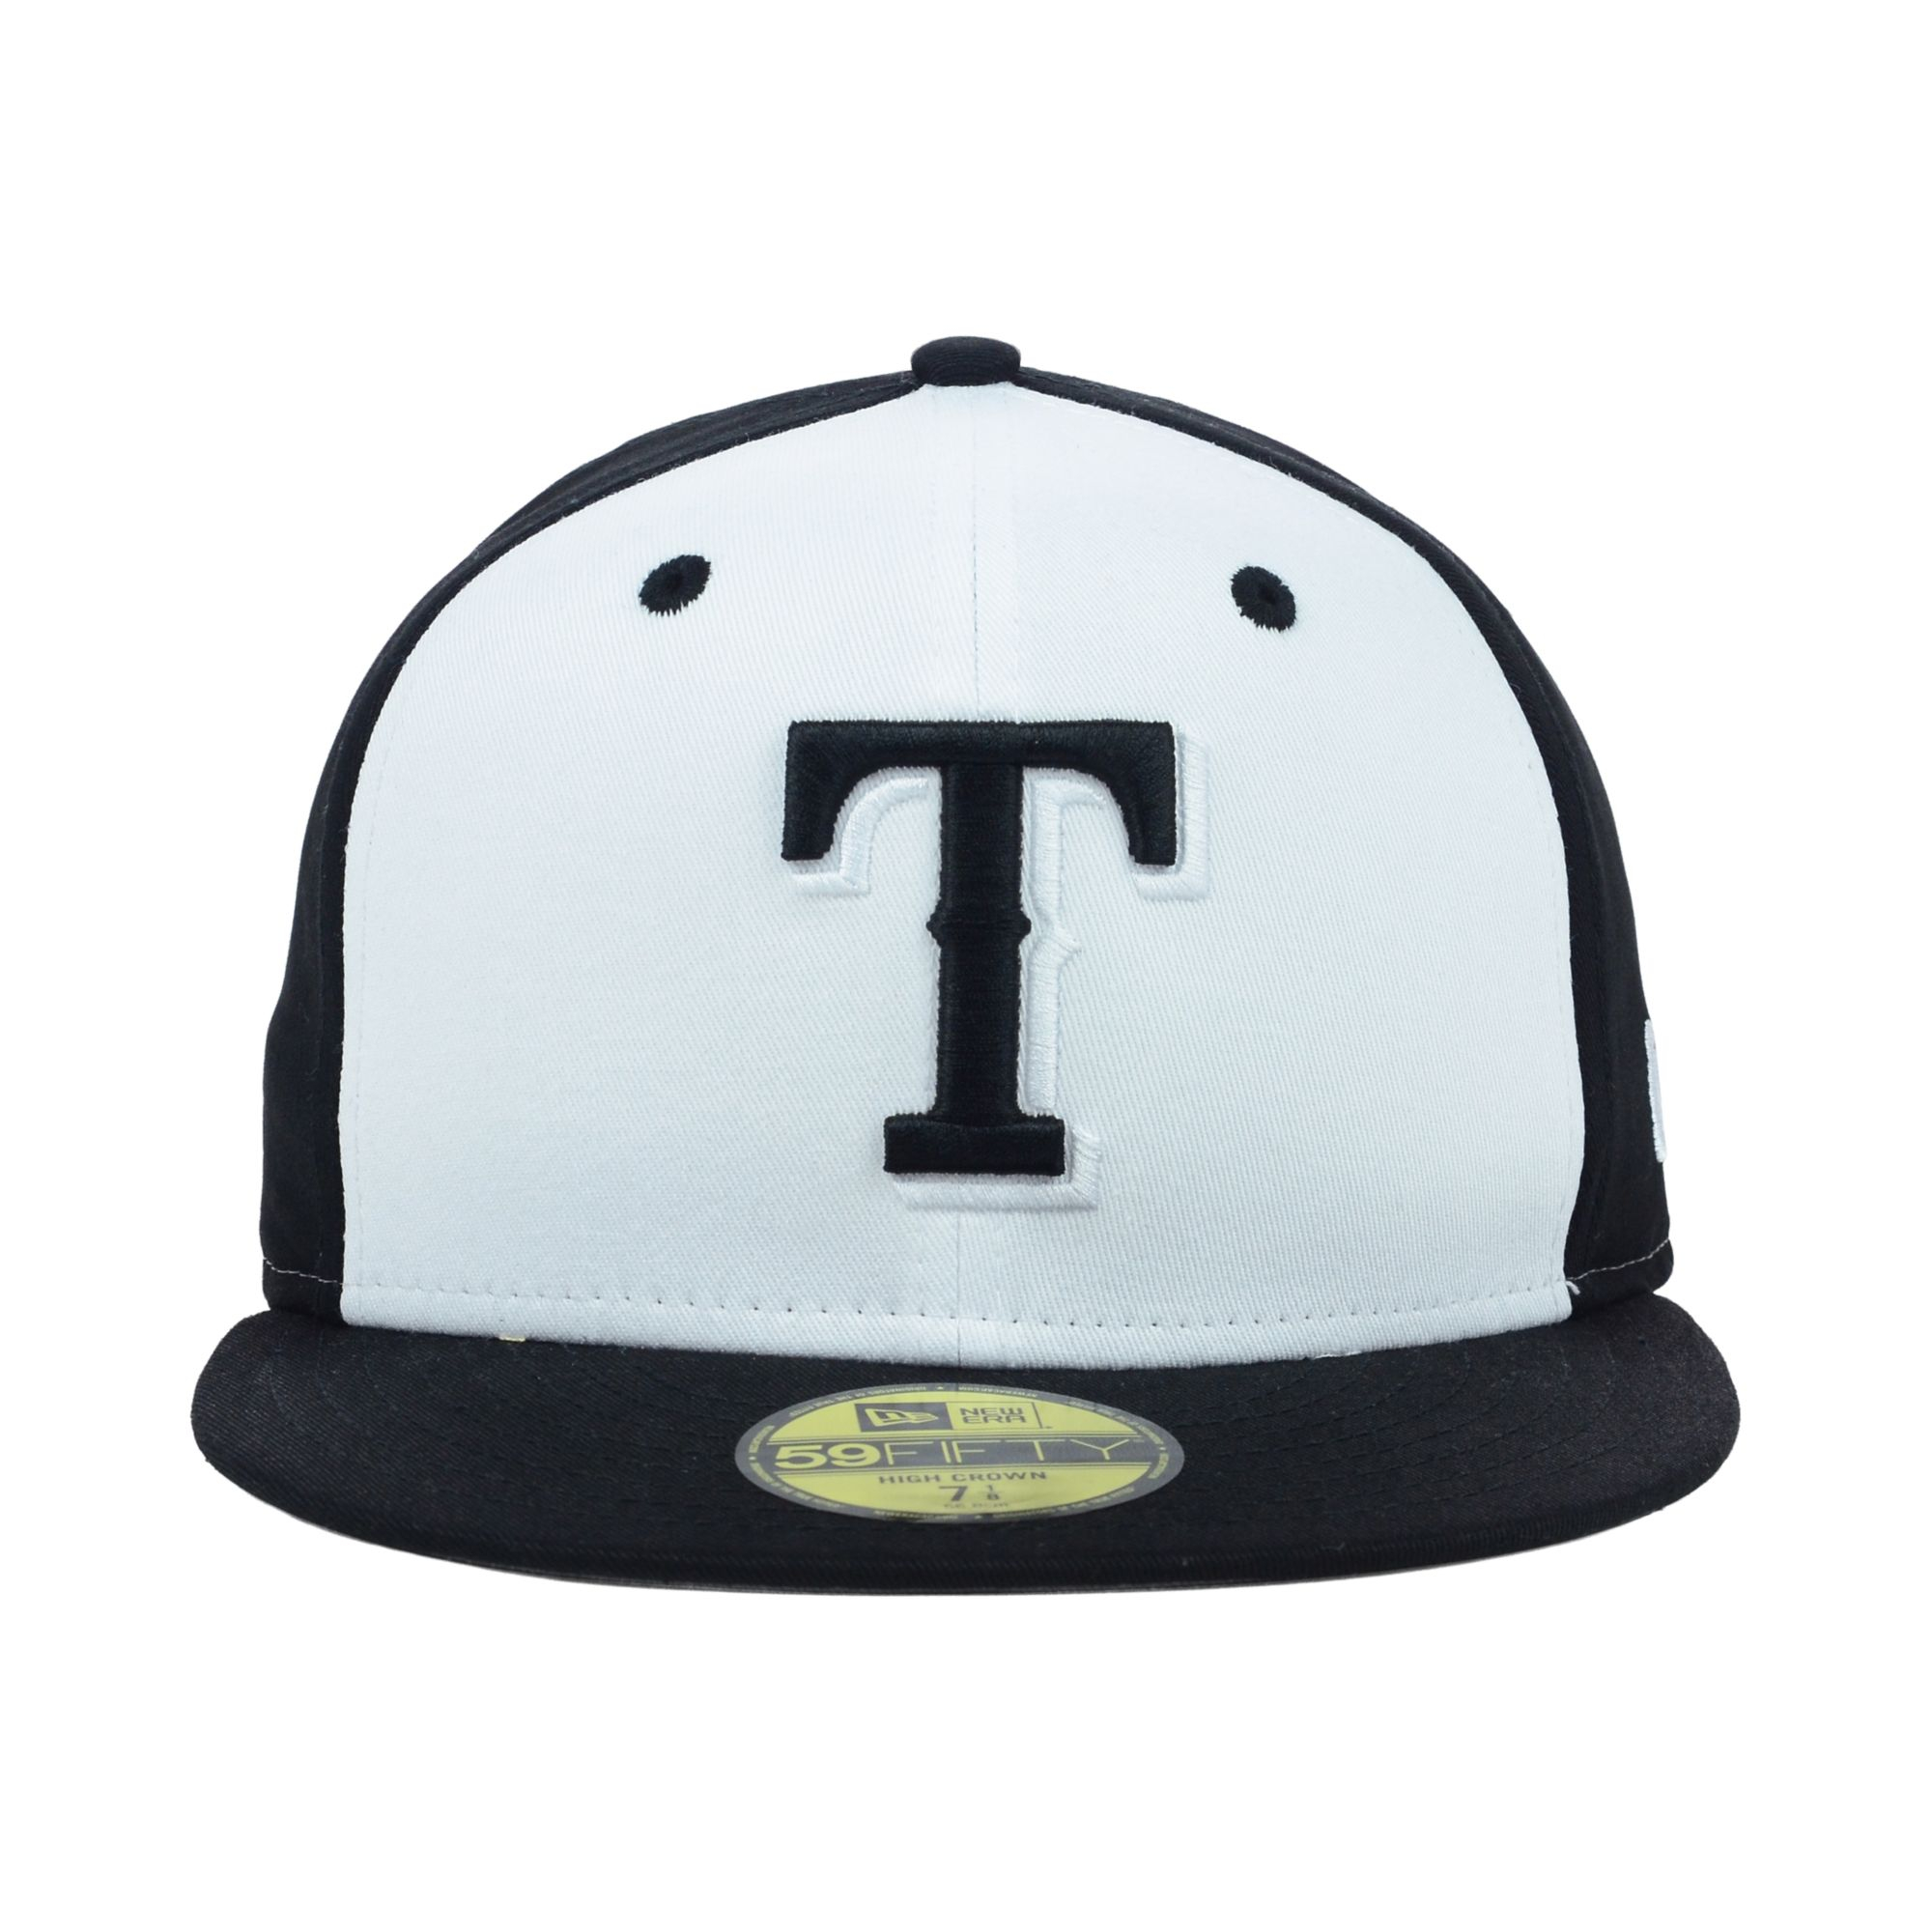 f1a662a37f0 Lyst - KTZ Texas Rangers Mlb High Heat 59fifty Cap in Black for Men